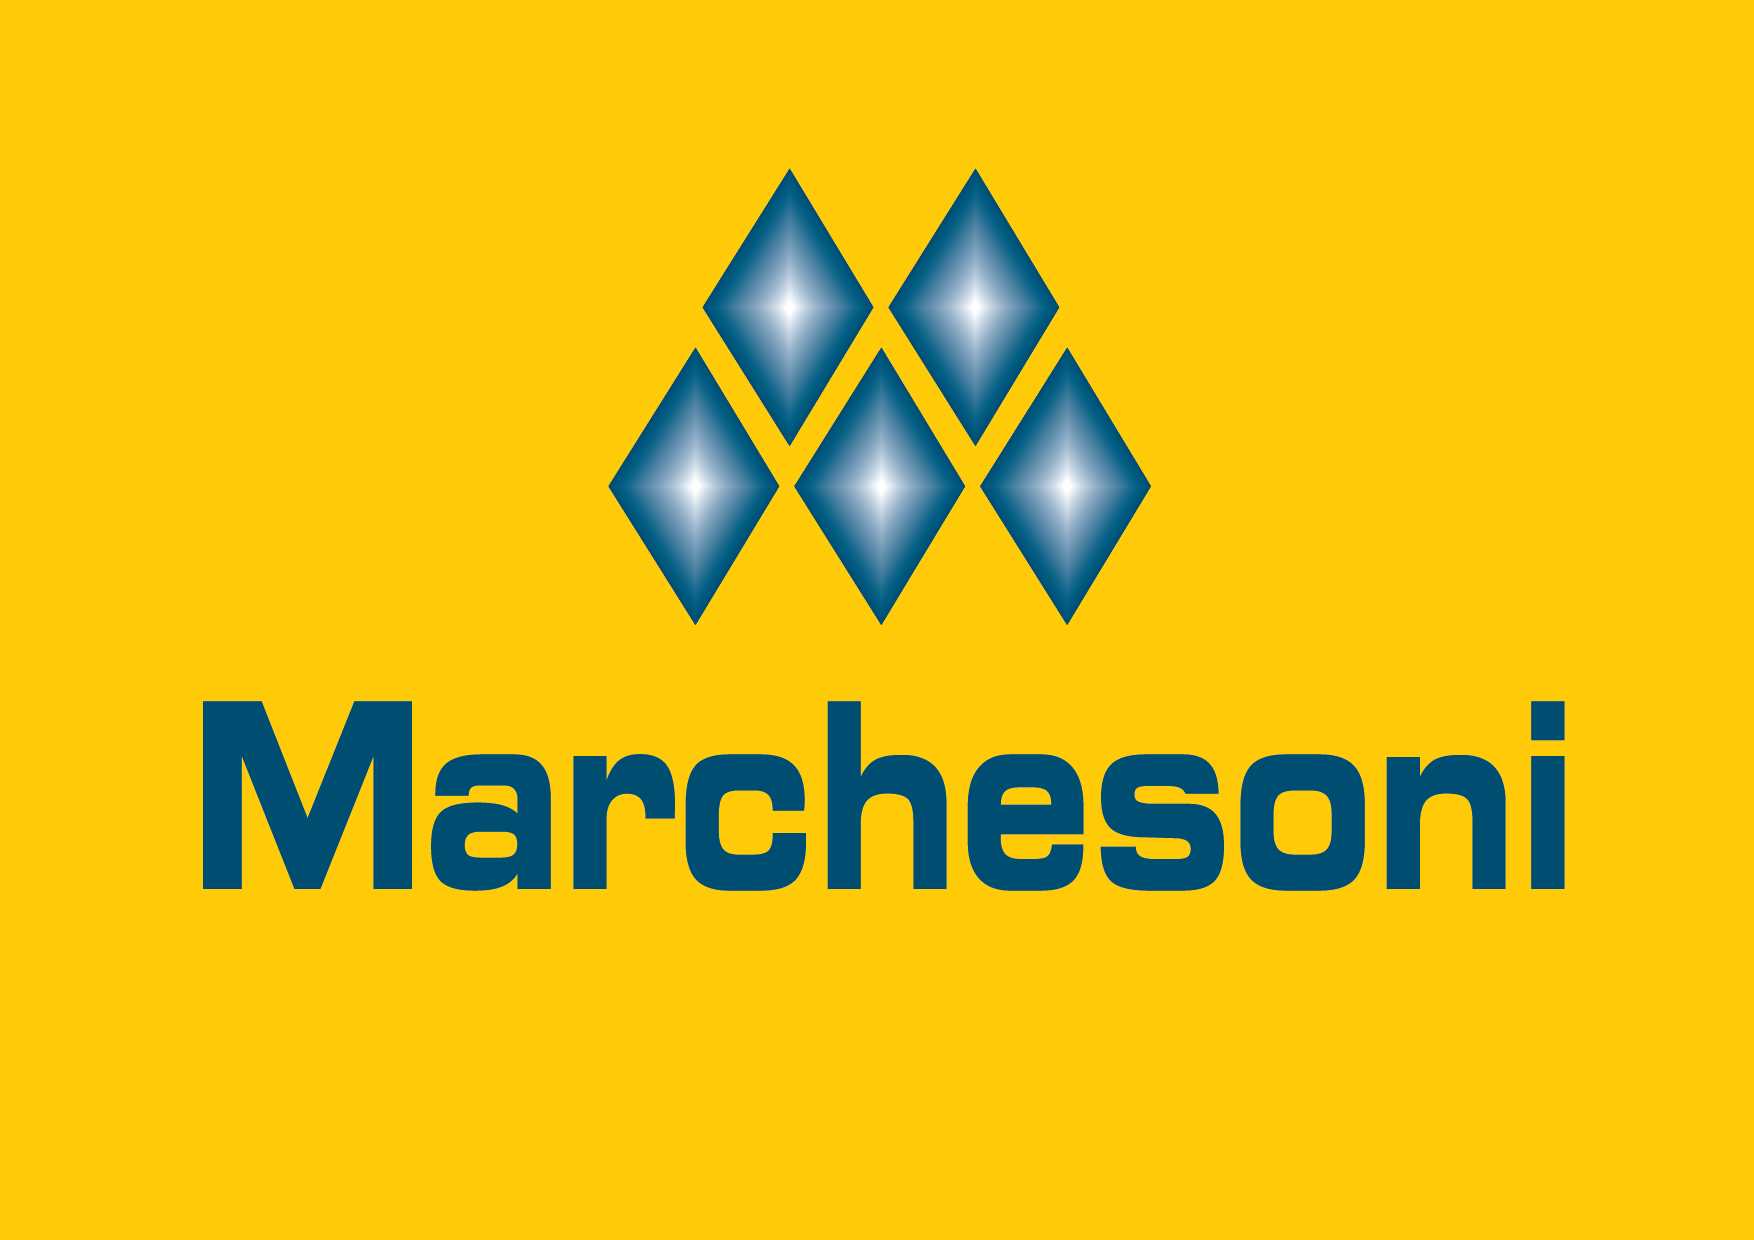 Esterilizador Marchesoni com 2 Bules em INOX - ES.1.291/292  - Carmel Equipamentos